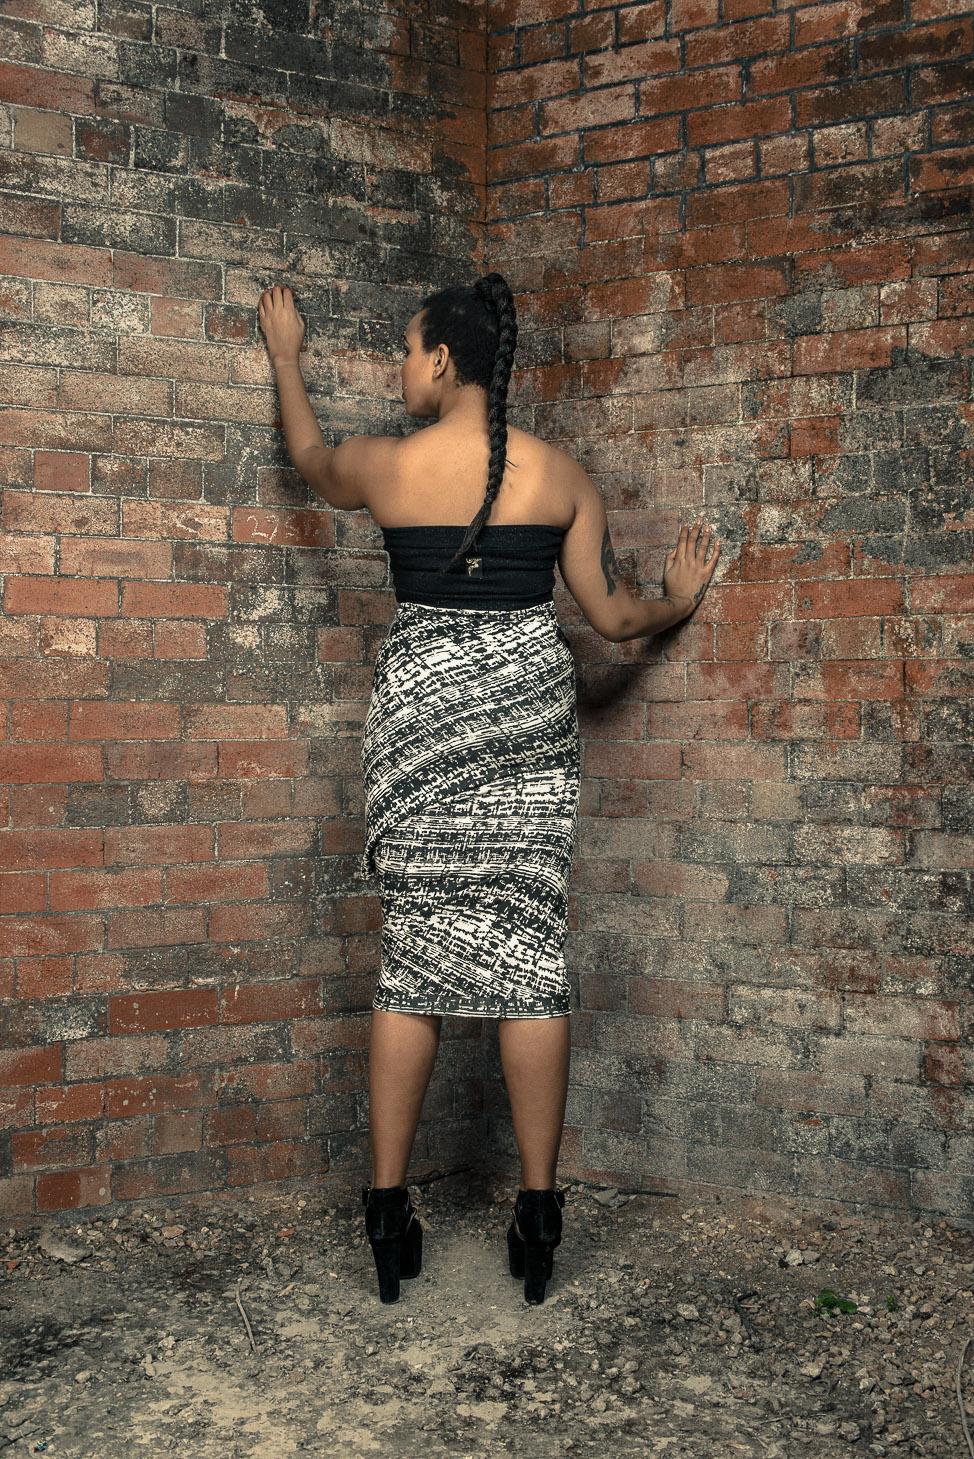 zaramia-ava-zaramiaava-leeds-fashion-designer-ethical-sustainable-tailored-minimalist-skirt-print-bandeau-maxi-versatile-drape-grey-bodysuit-black-obi-belt-wrap-cowl-styling-womenswear-models--36